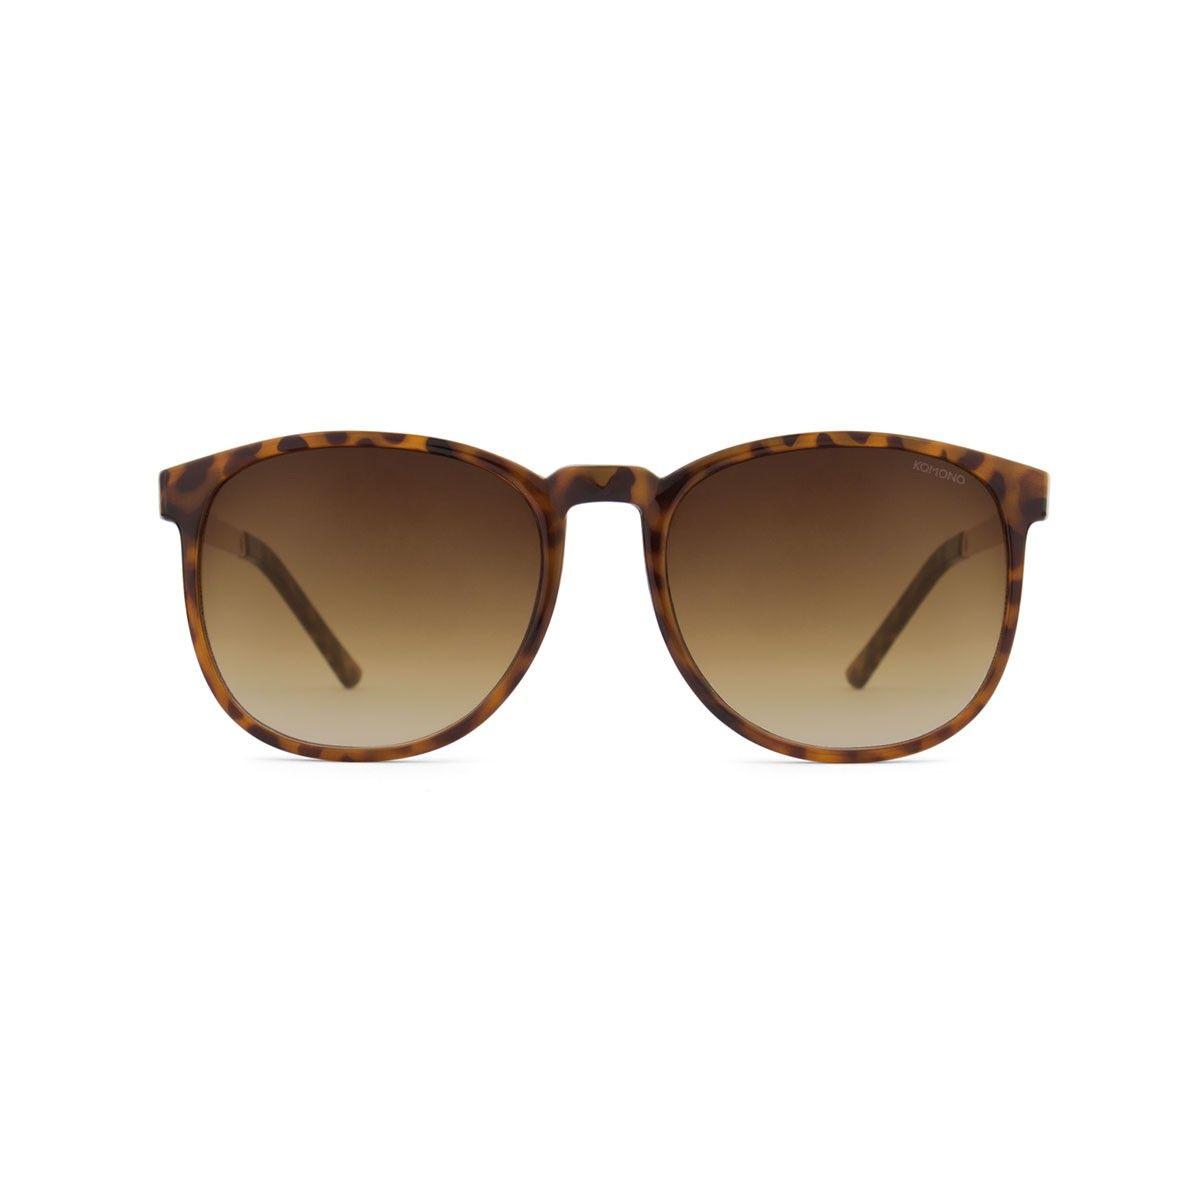 Komono Francis Metal Rose Gold/Tortoise brown Lunettes de Soleil v793a